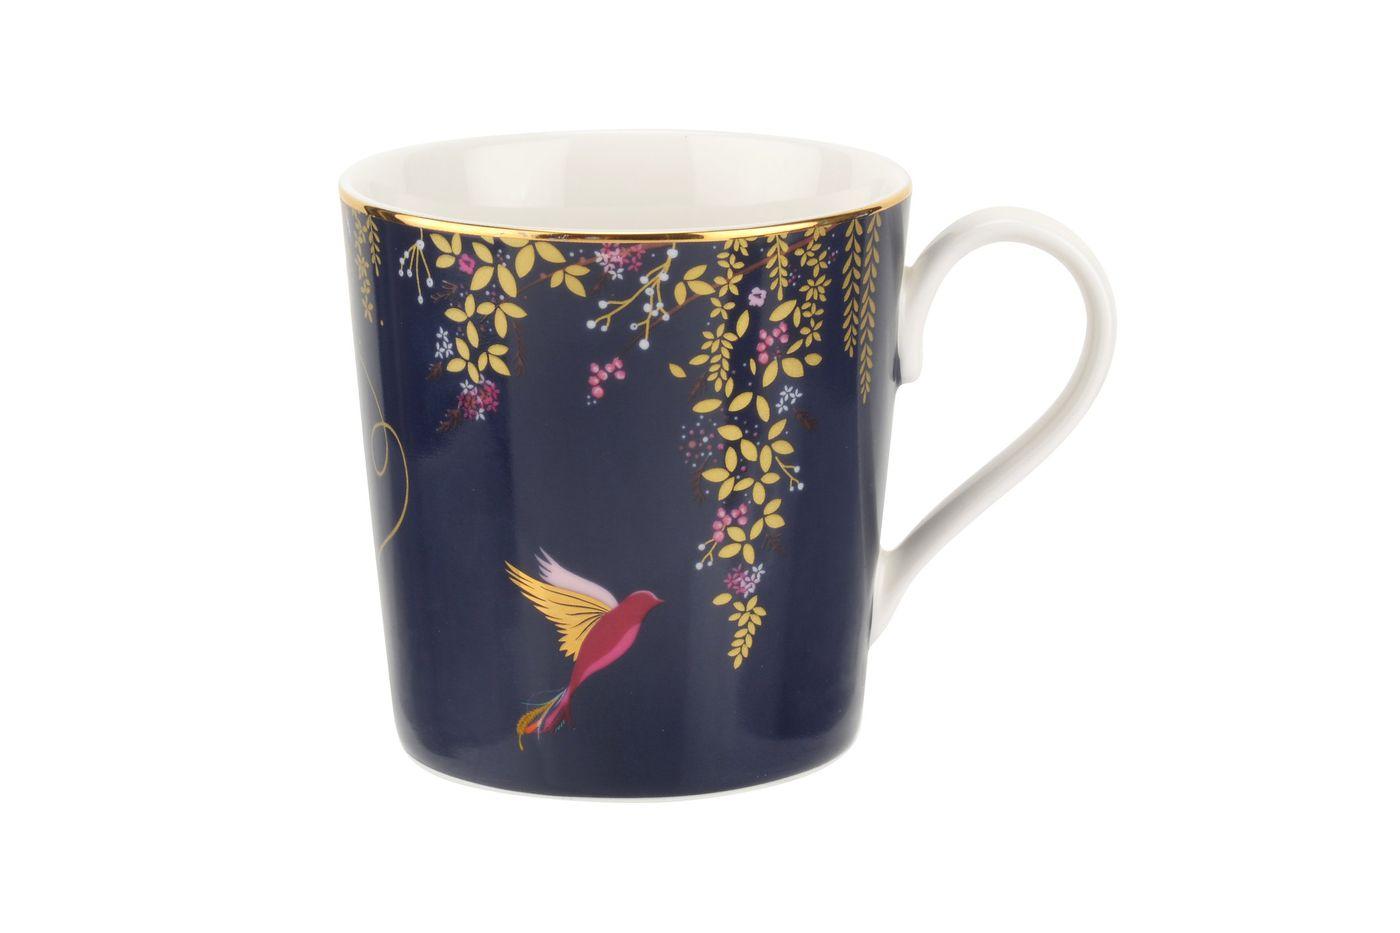 Sara Miller London for Portmeirion Chelsea Collection Mug Navy 0.34l thumb 1